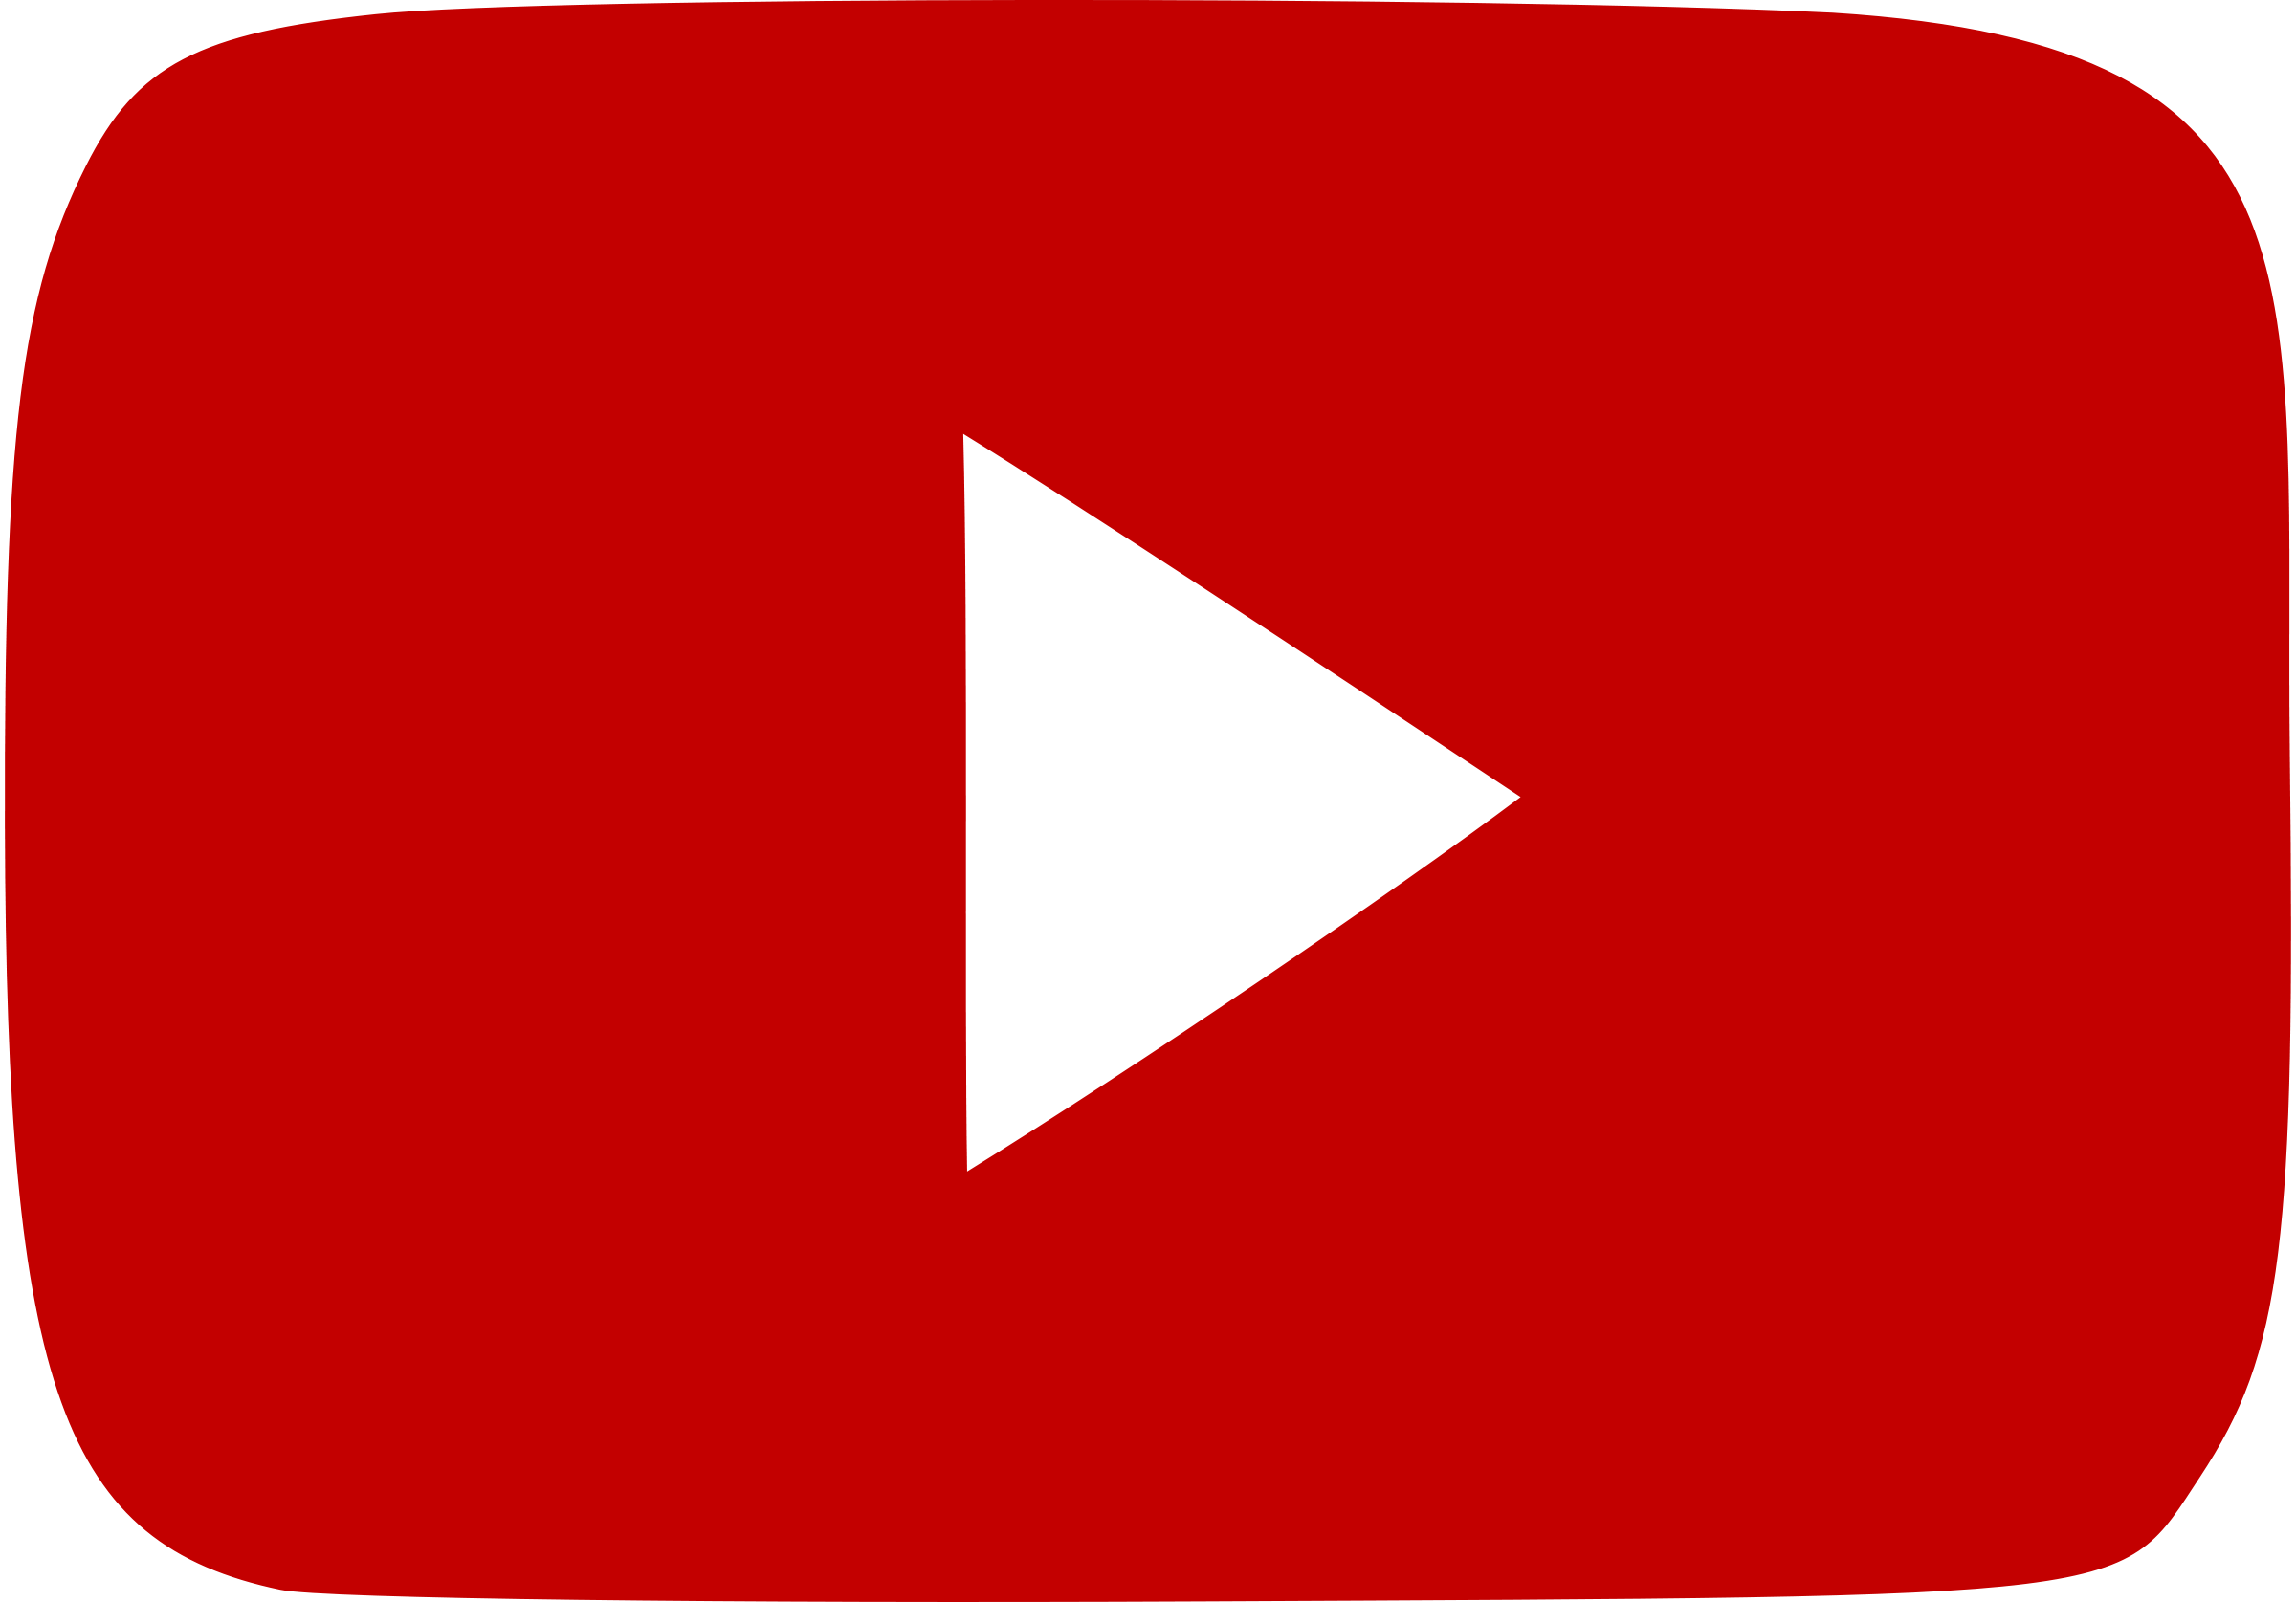 youtube-play-button-jq09nq-clipart-youtube-play-button-jq09nq-clipart-2